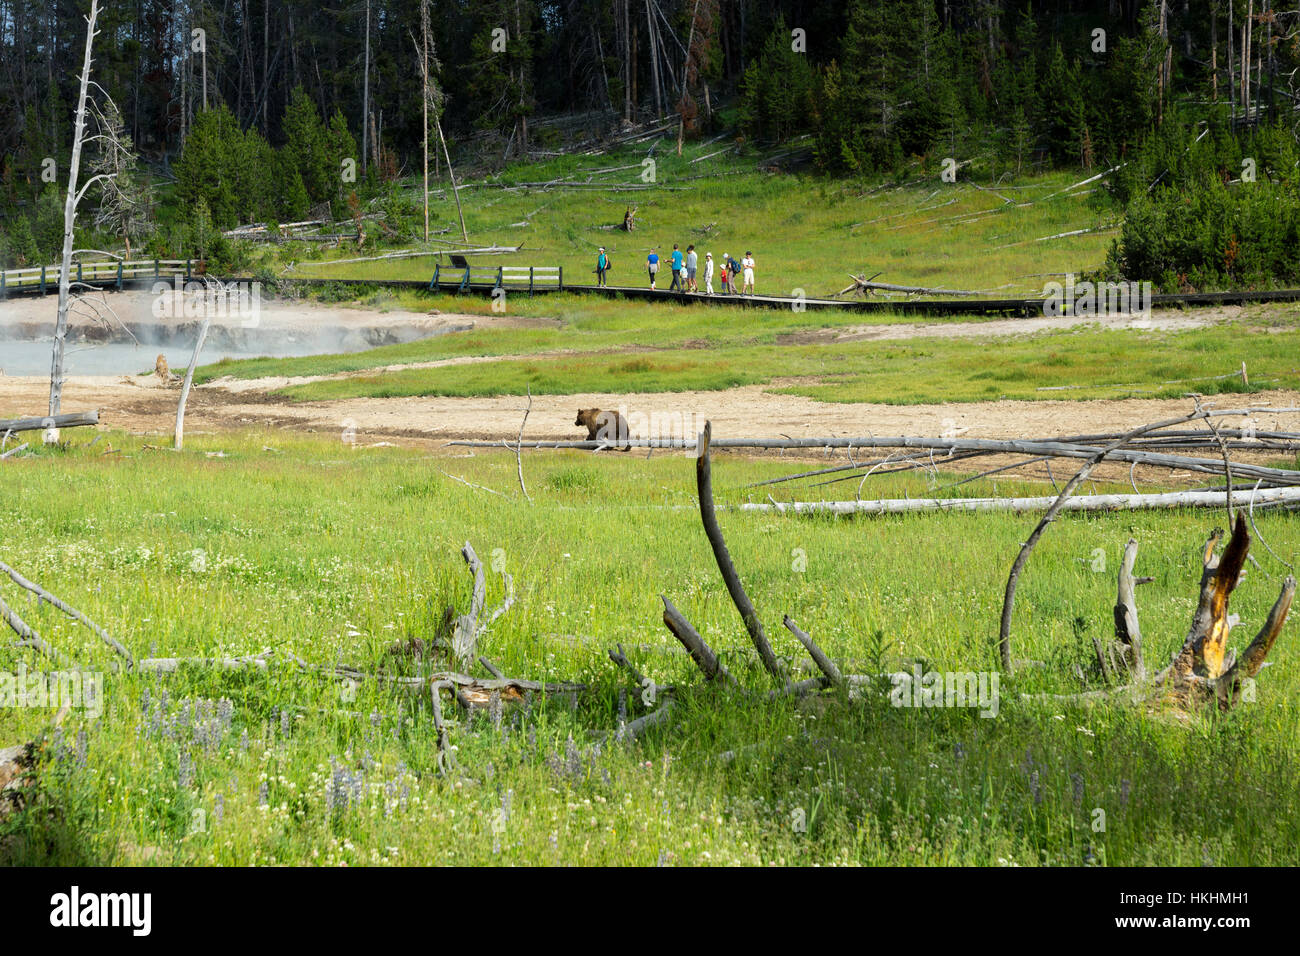 Bear in Mud Volcano Area, Yellowstone National Park, Wyoming, USA - Stock Image